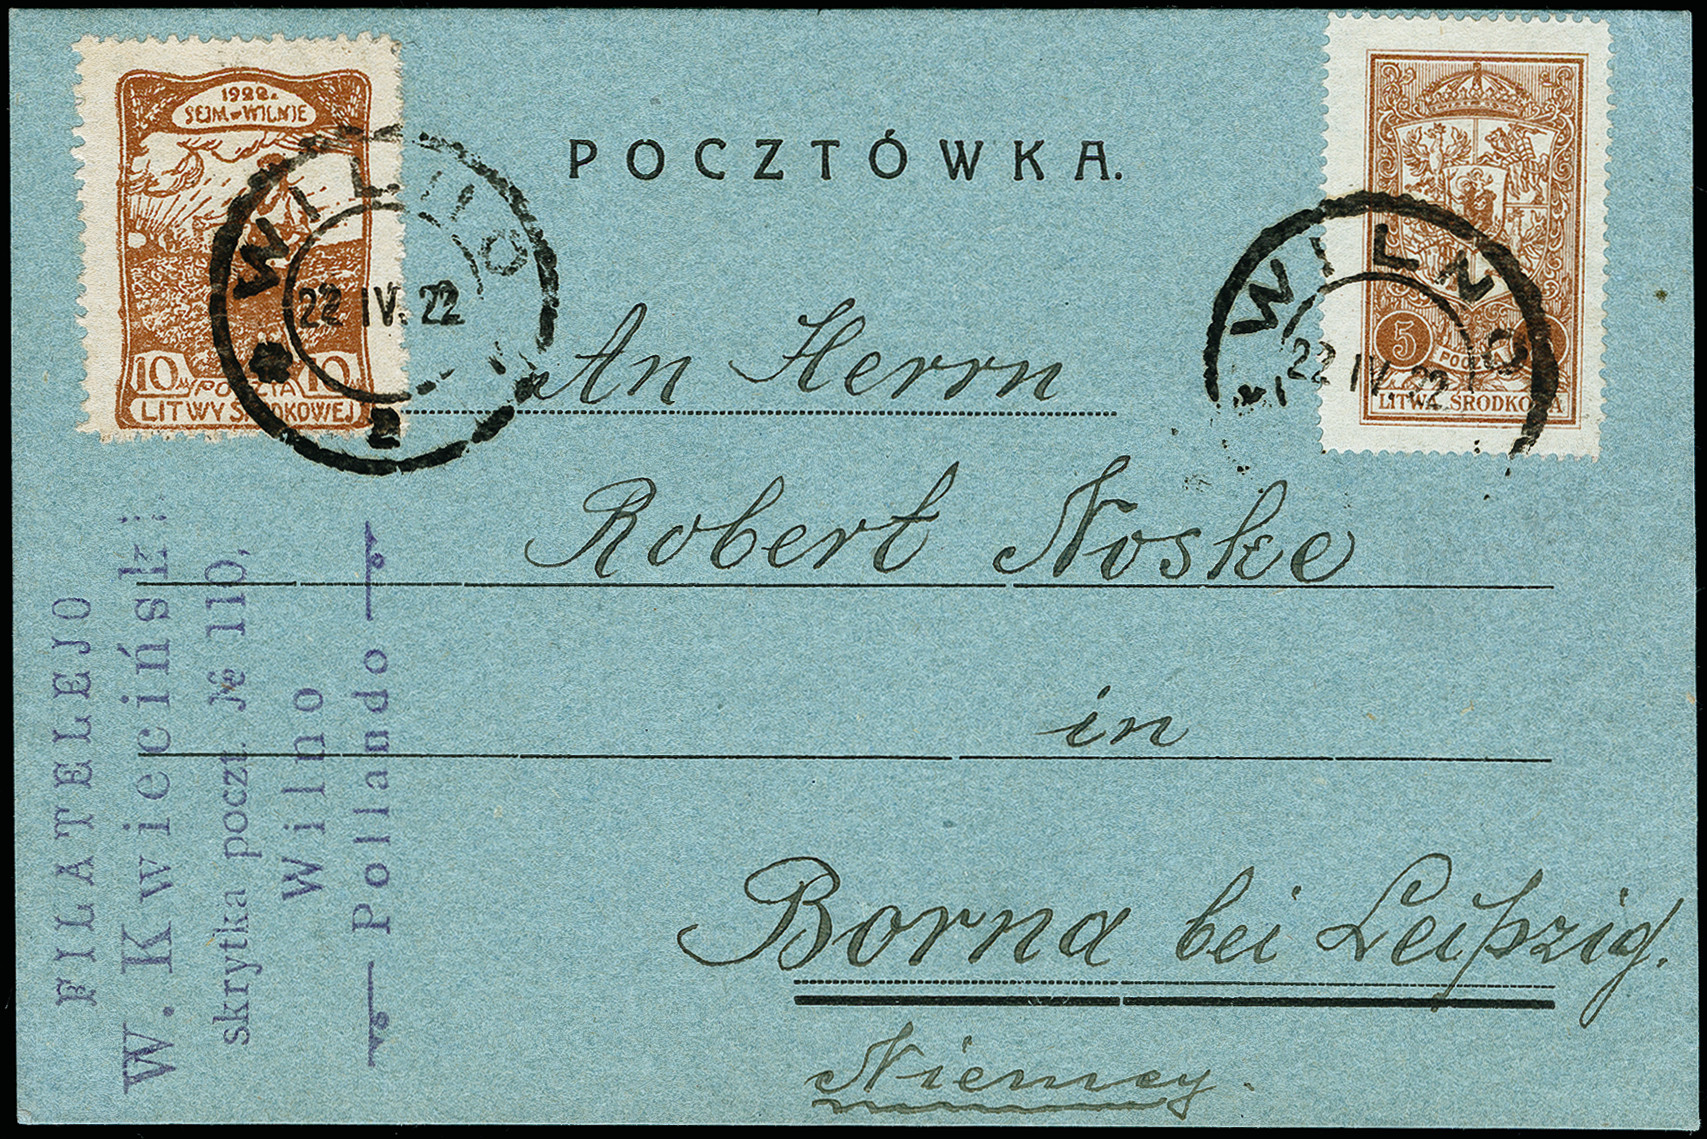 Lot 190 - europe central lithuania -  Heinrich Koehler Auktionen 373rd Heinrich Köhler auction - Day 1